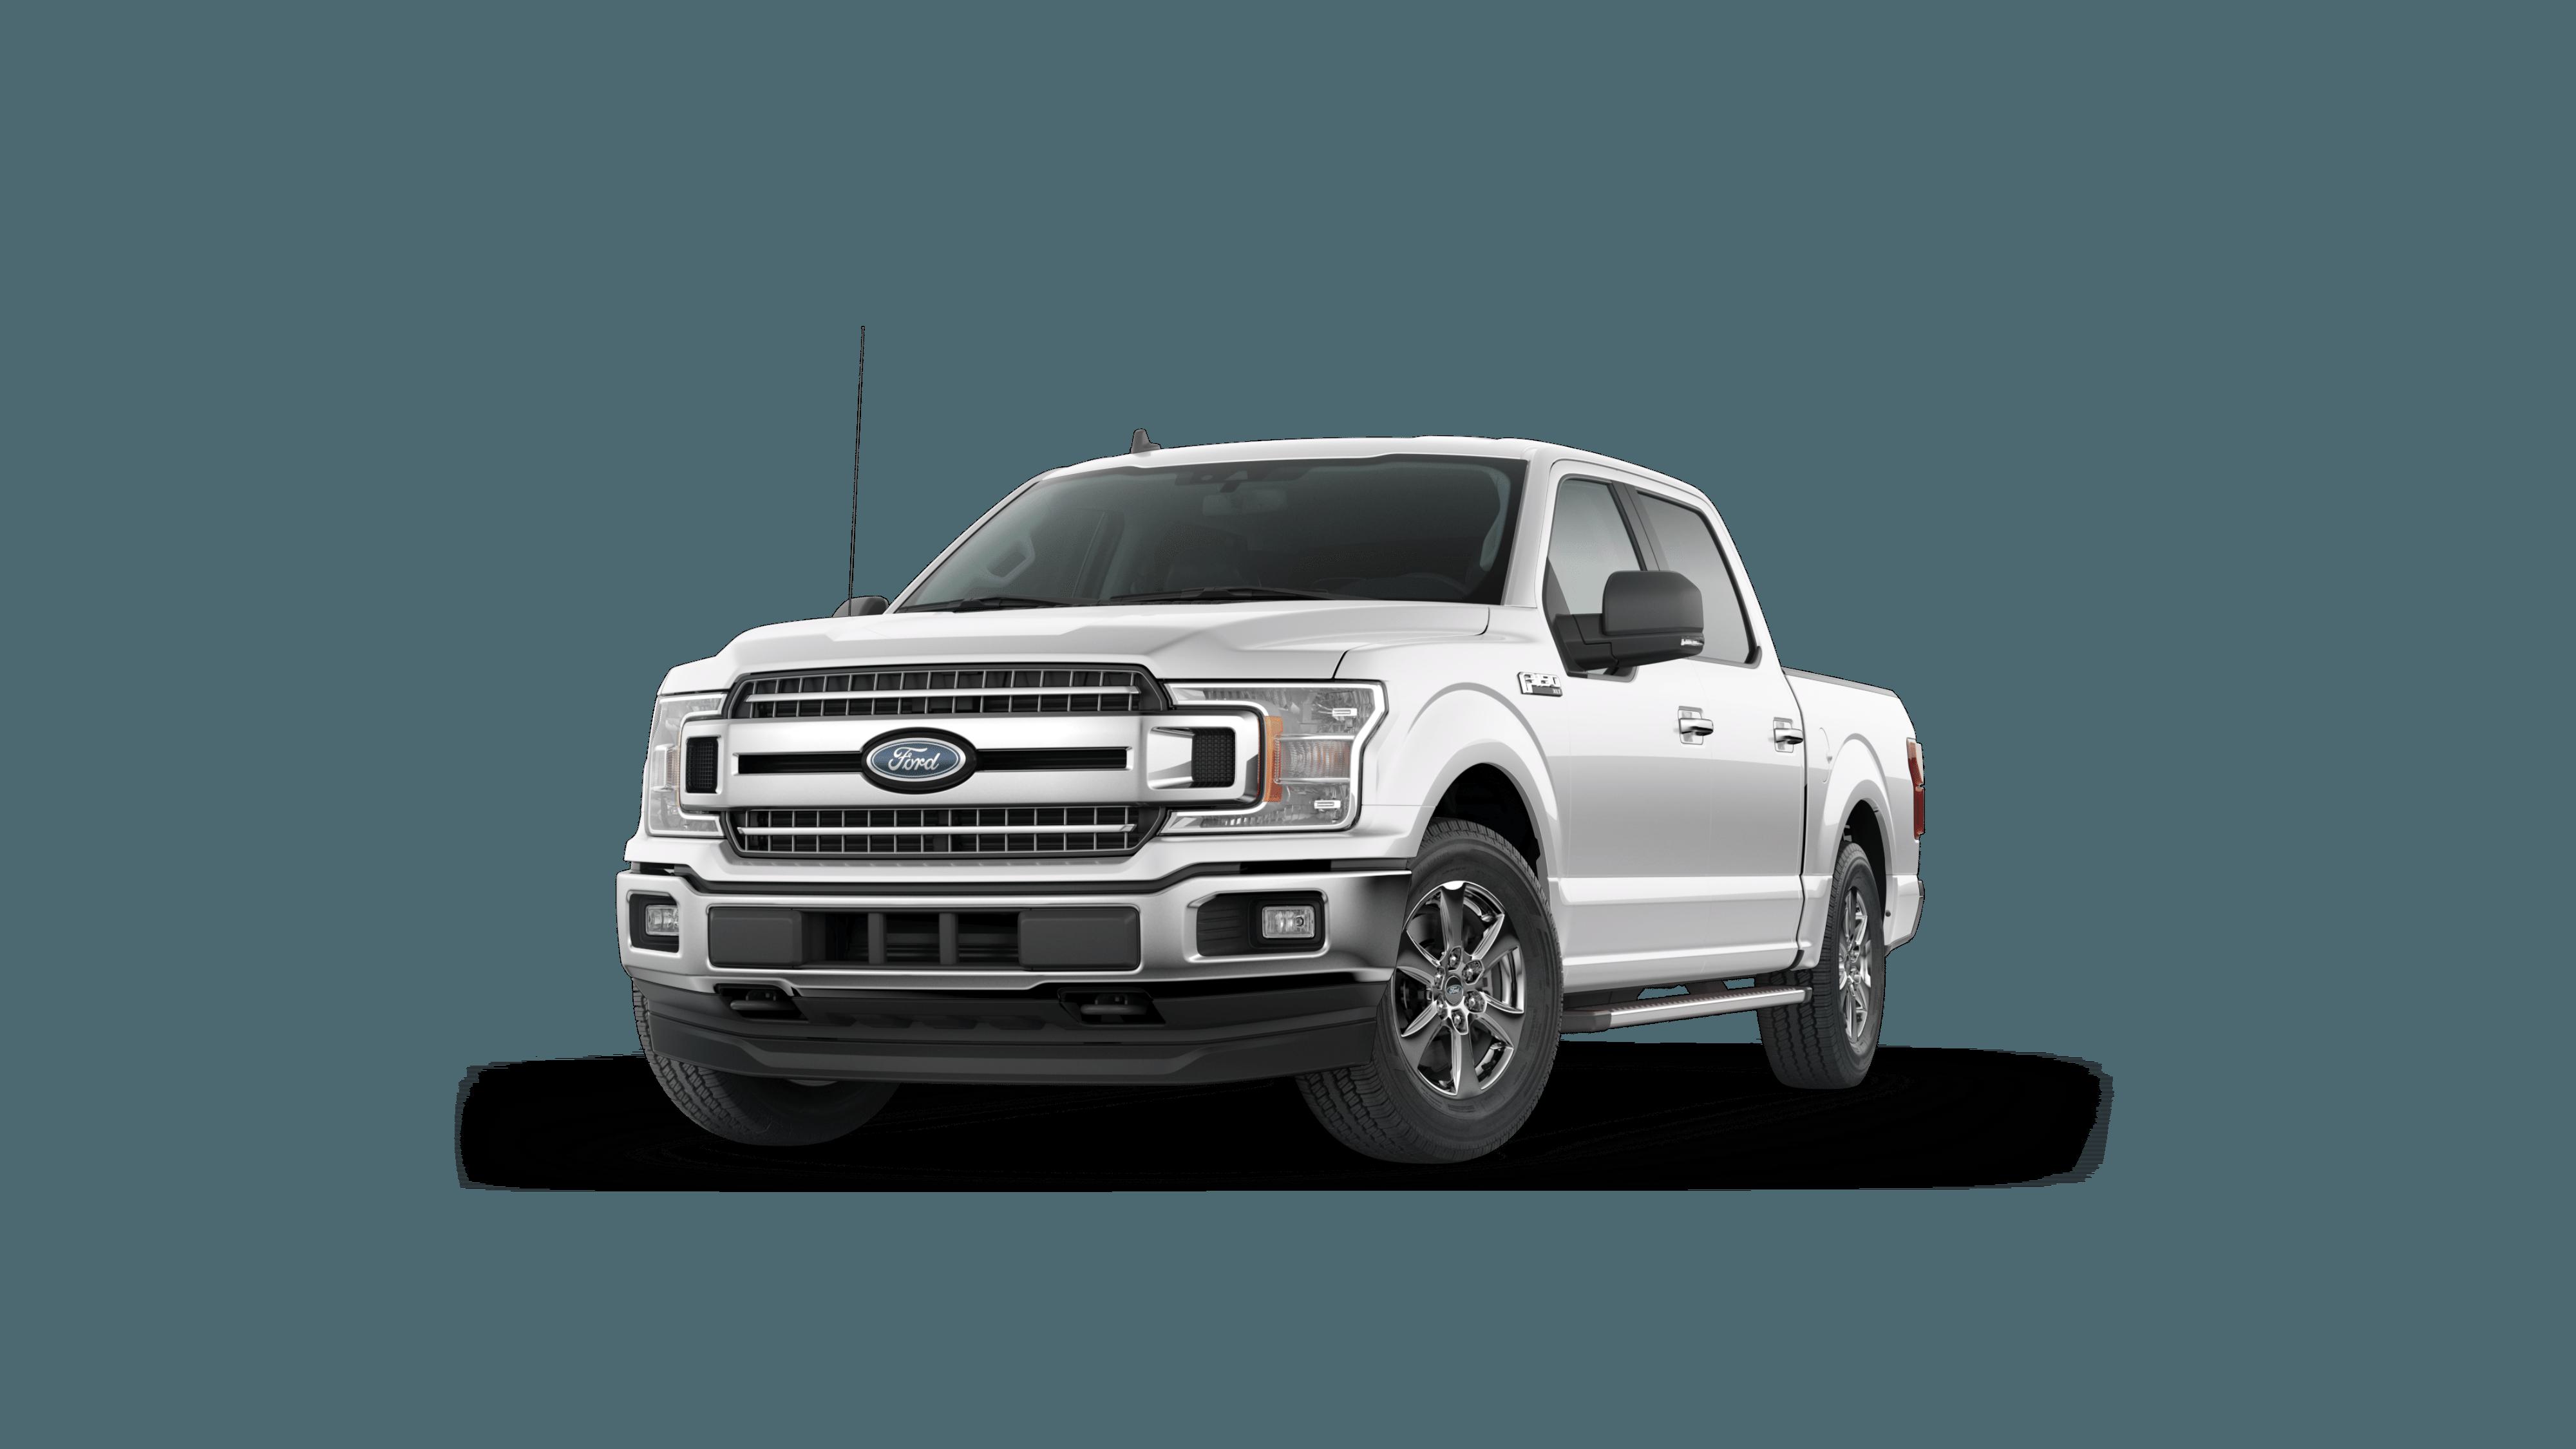 2019 ford f 150 for sale in tukwila 1ftew1e49kkd30054